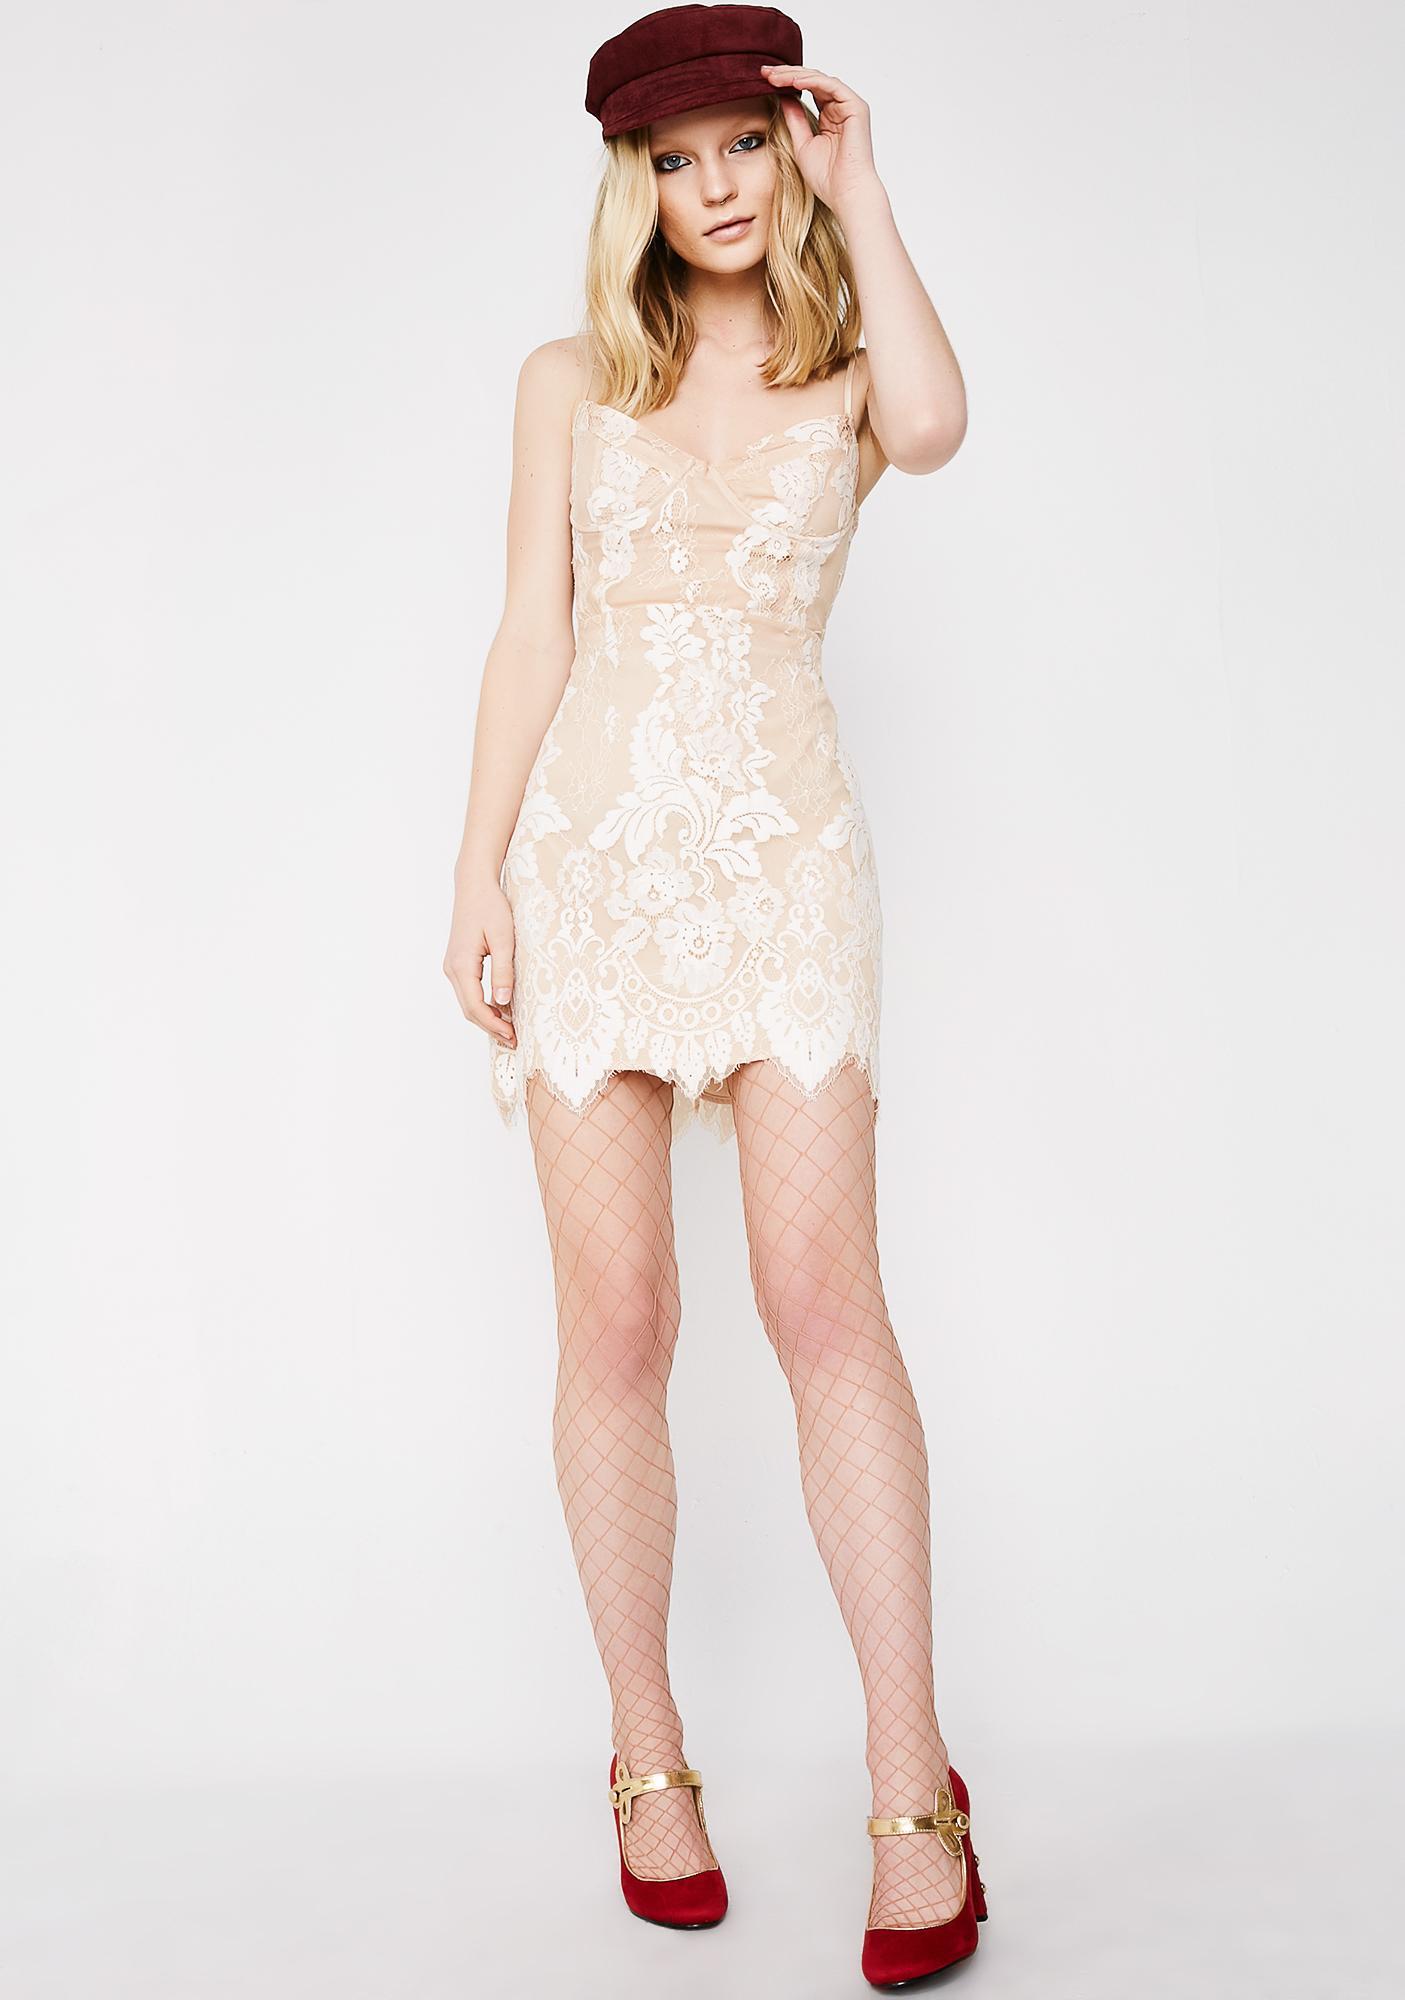 Lookin' Lacey Dress